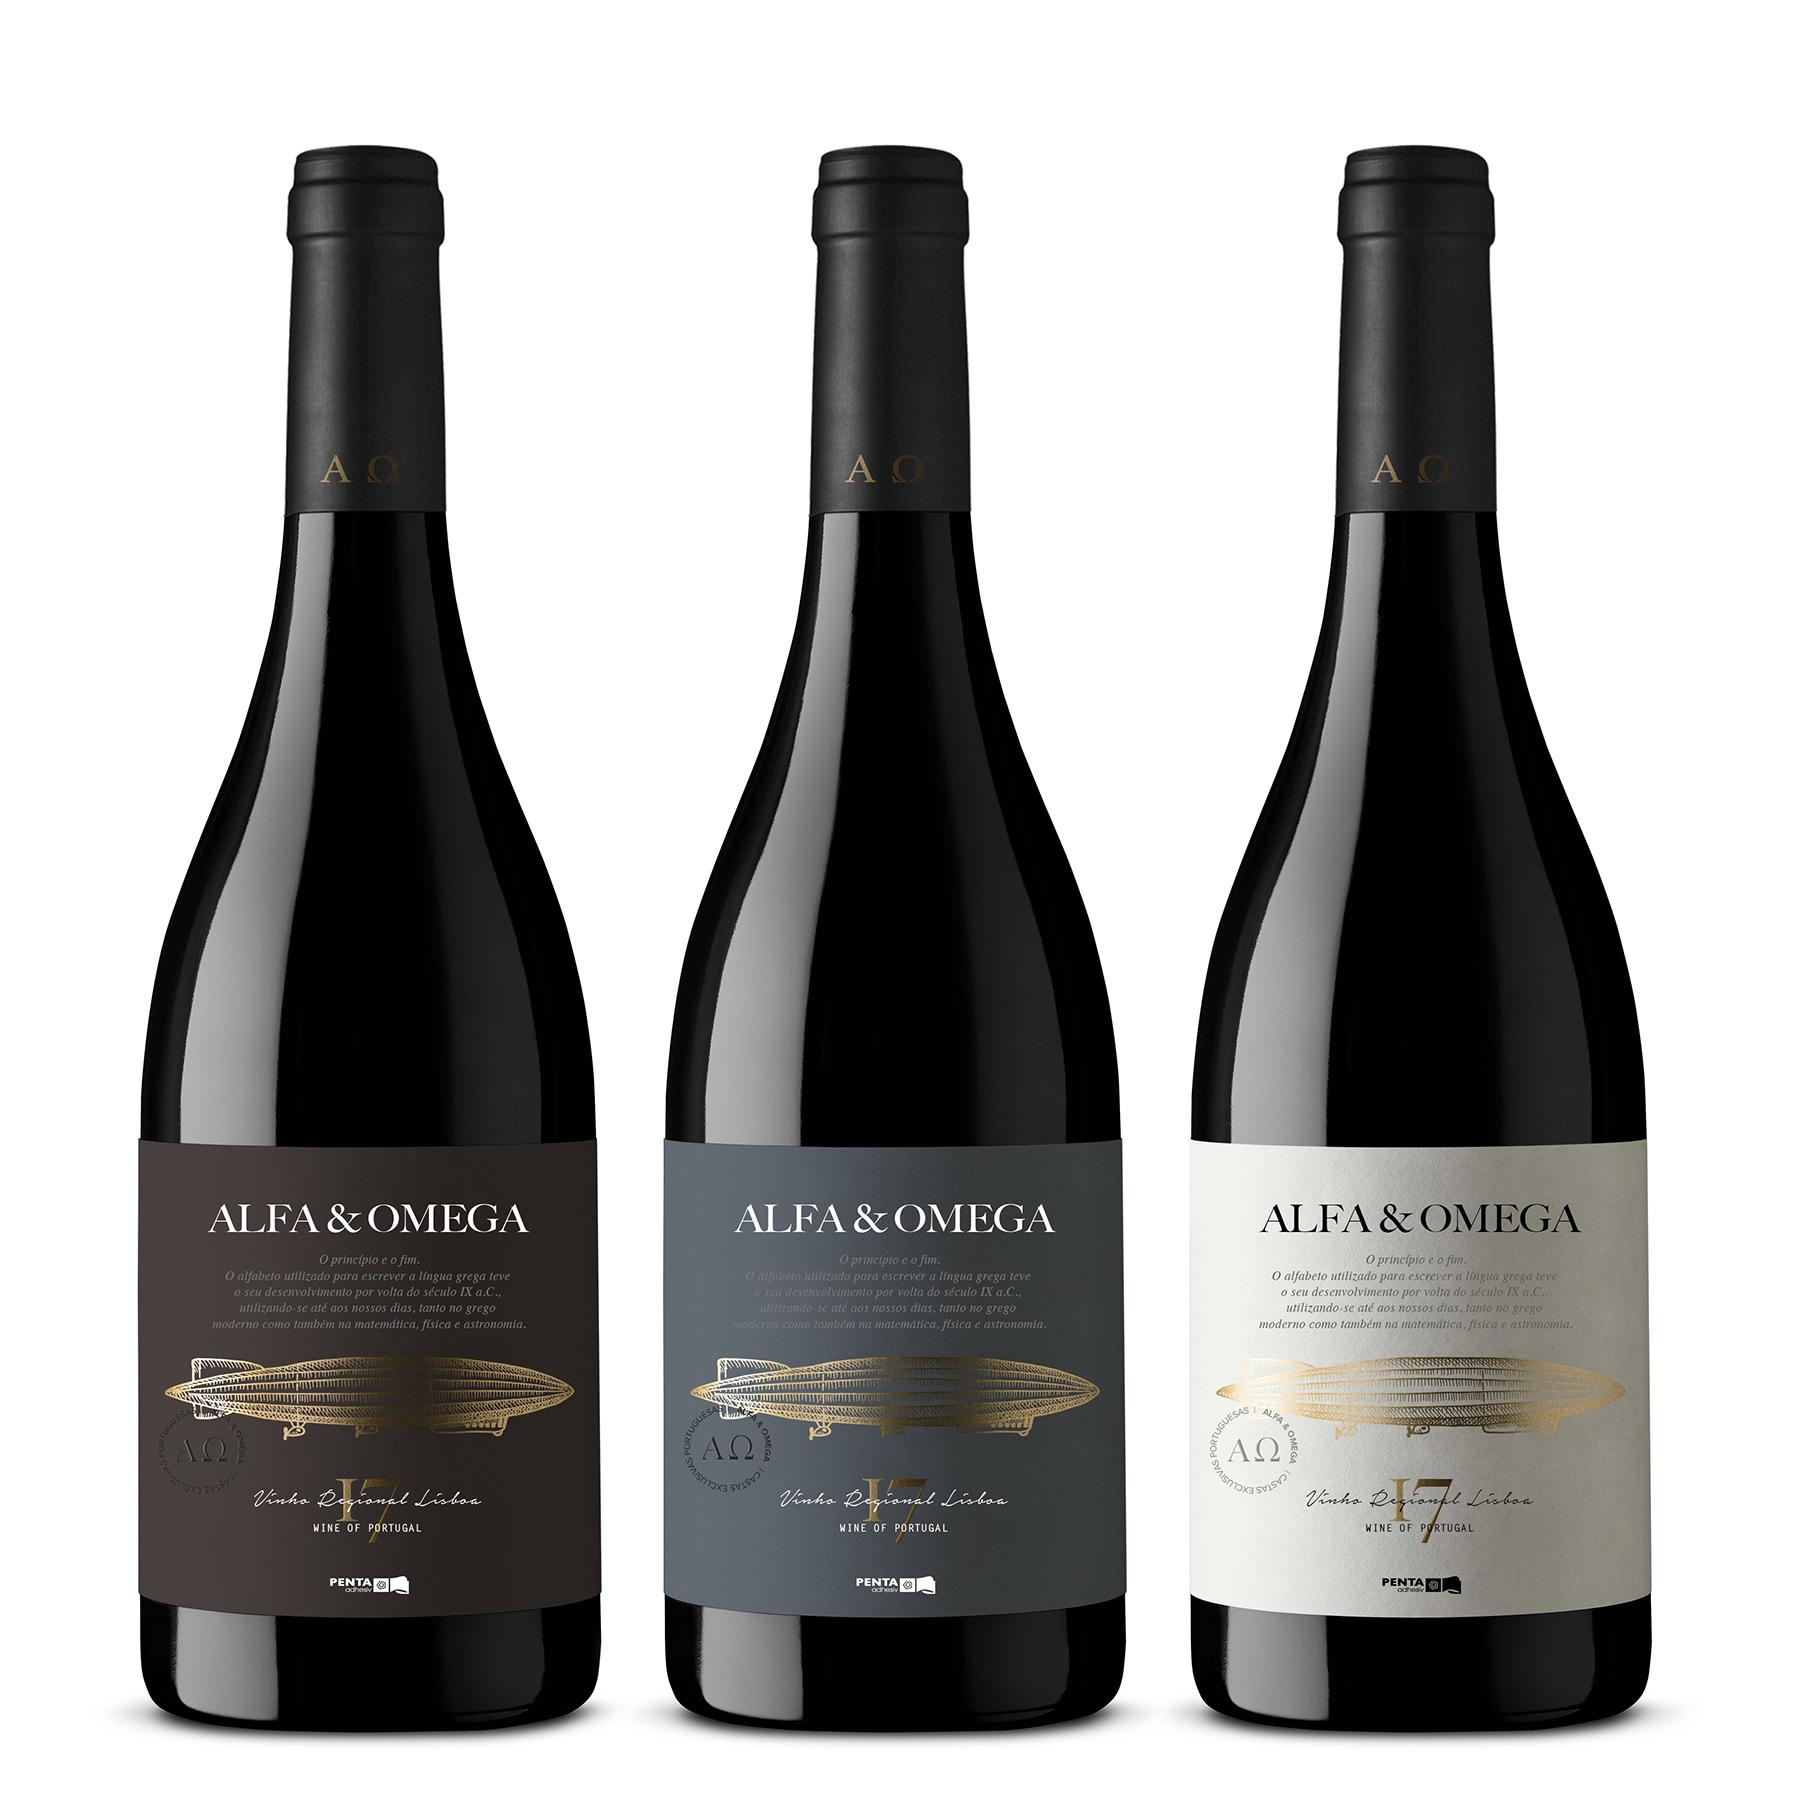 Wine Label Alfa & Omega from Portugal